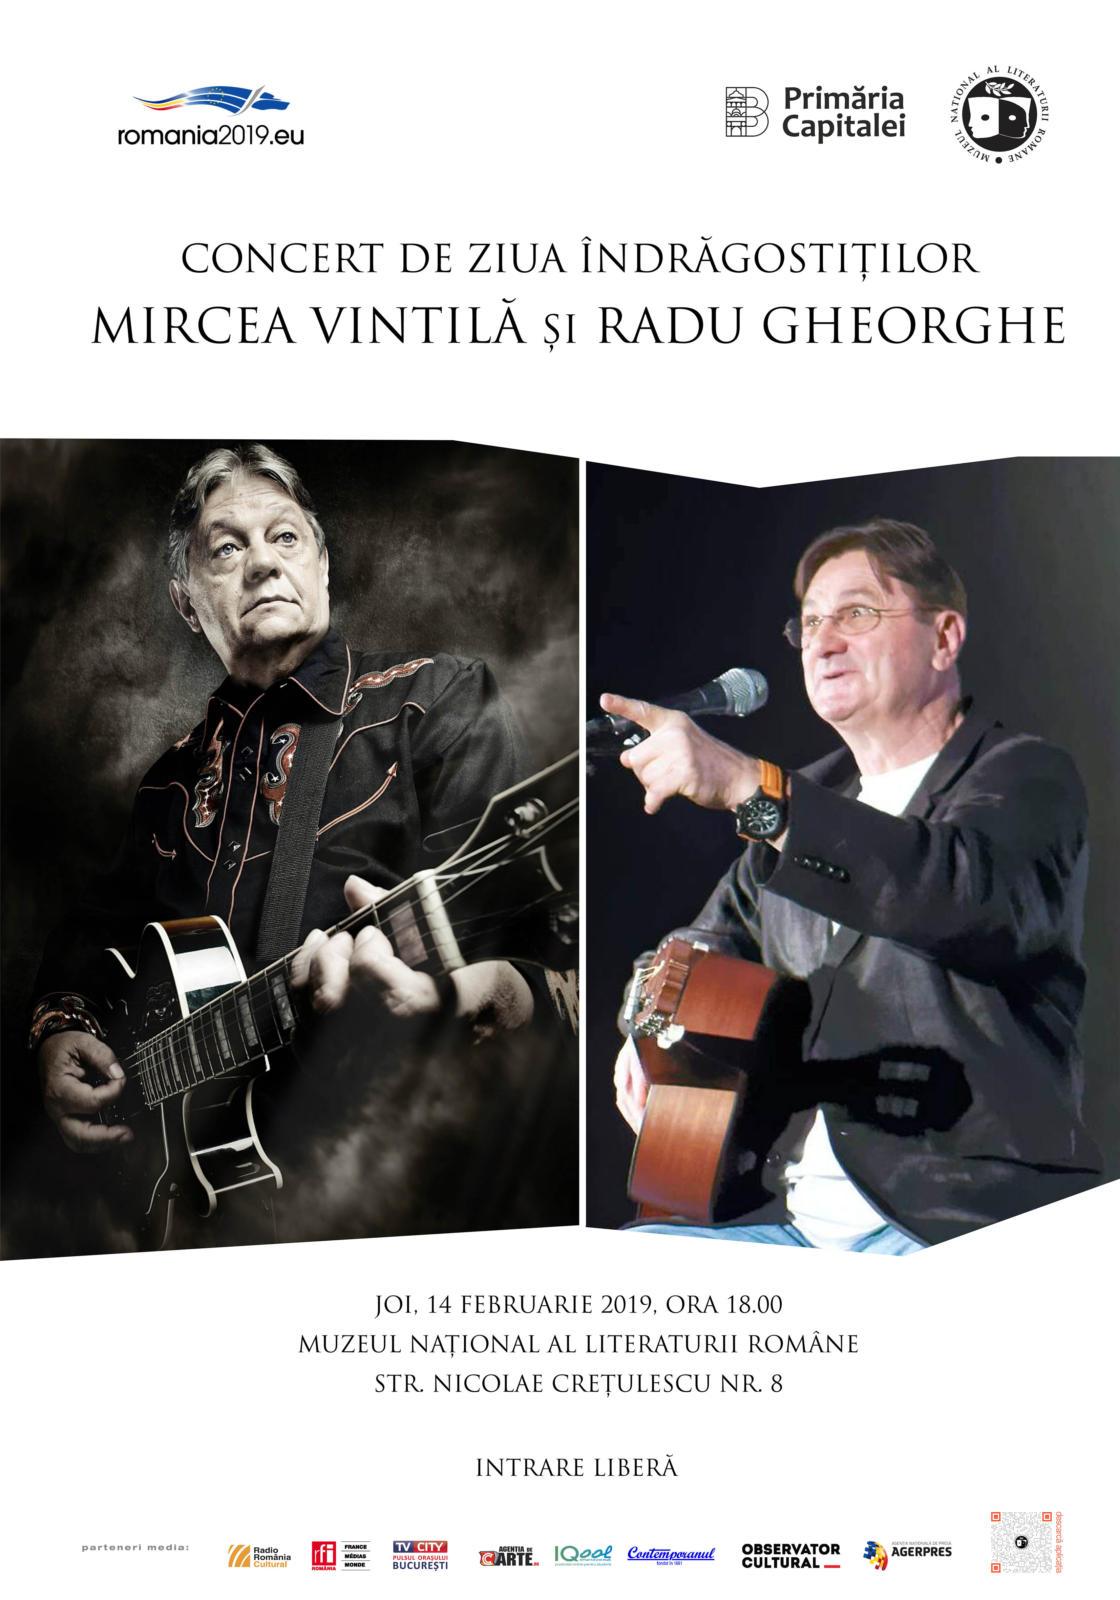 14-februarie-2019_Concert-de-ziua-indragostitilor-2-1120x1600